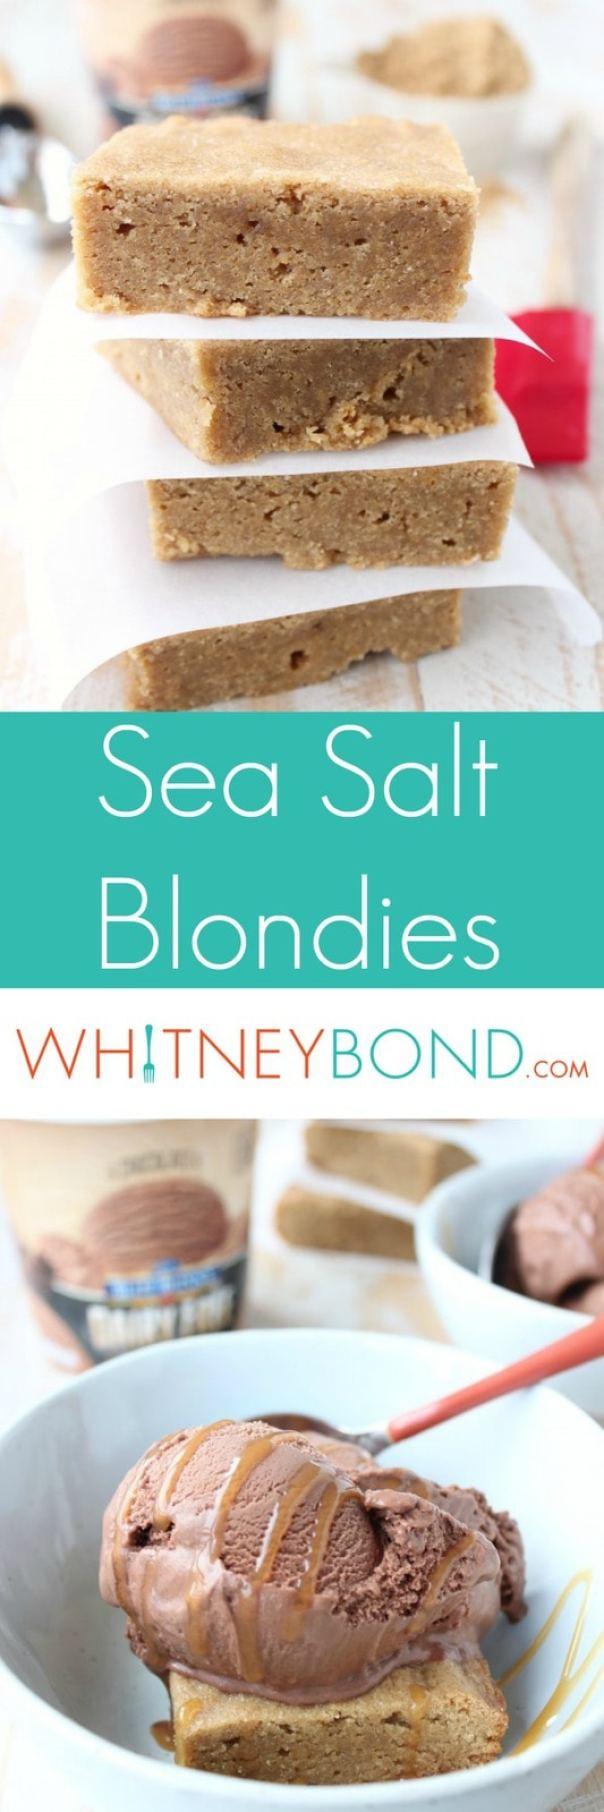 Sea Salt Blondies Recipe